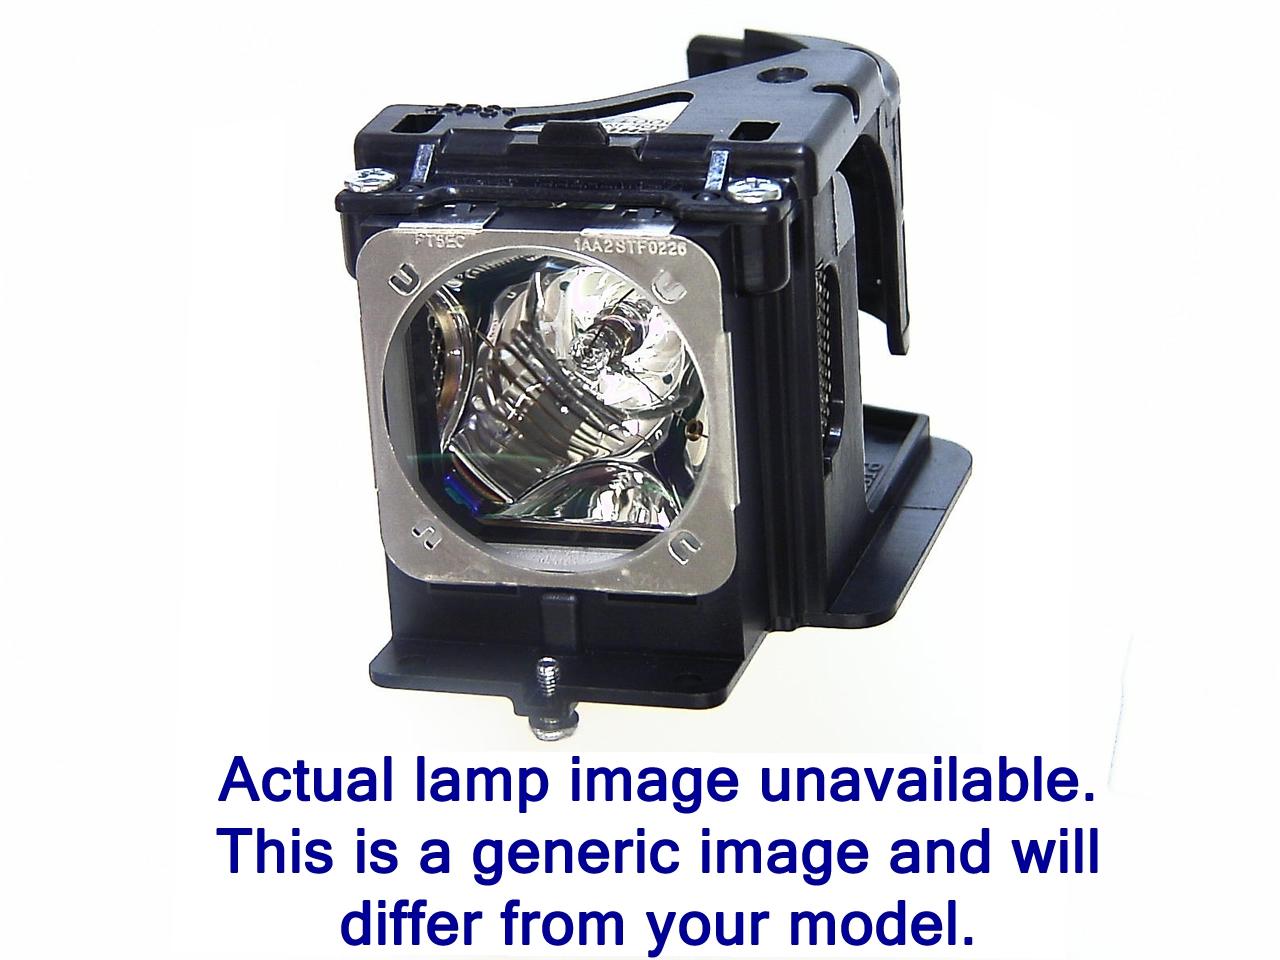 Smart Solo Bulbo For ZENITH RU52SZ51D (Philips bulb) TV Retroproyección.